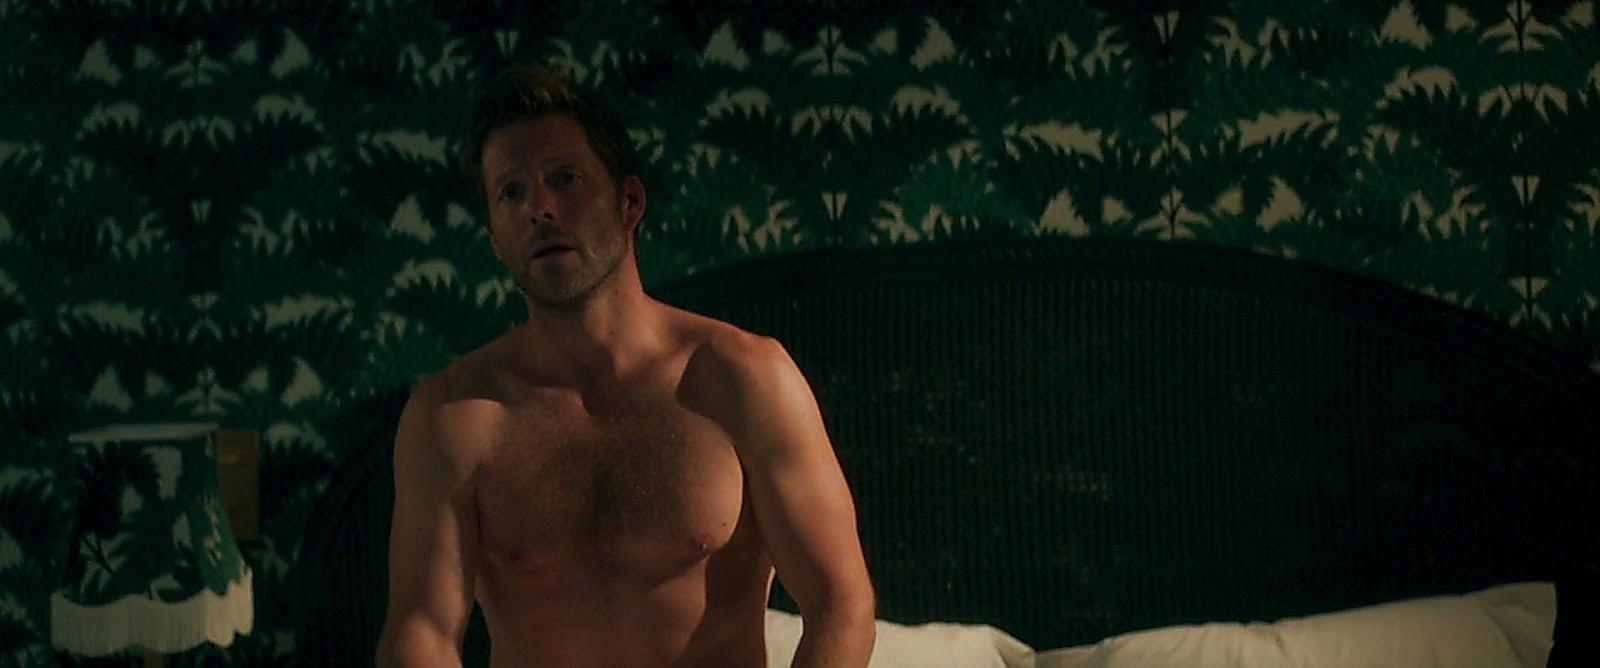 Jamie Bamber sexy shirtless scene July 19, 2017, 11am